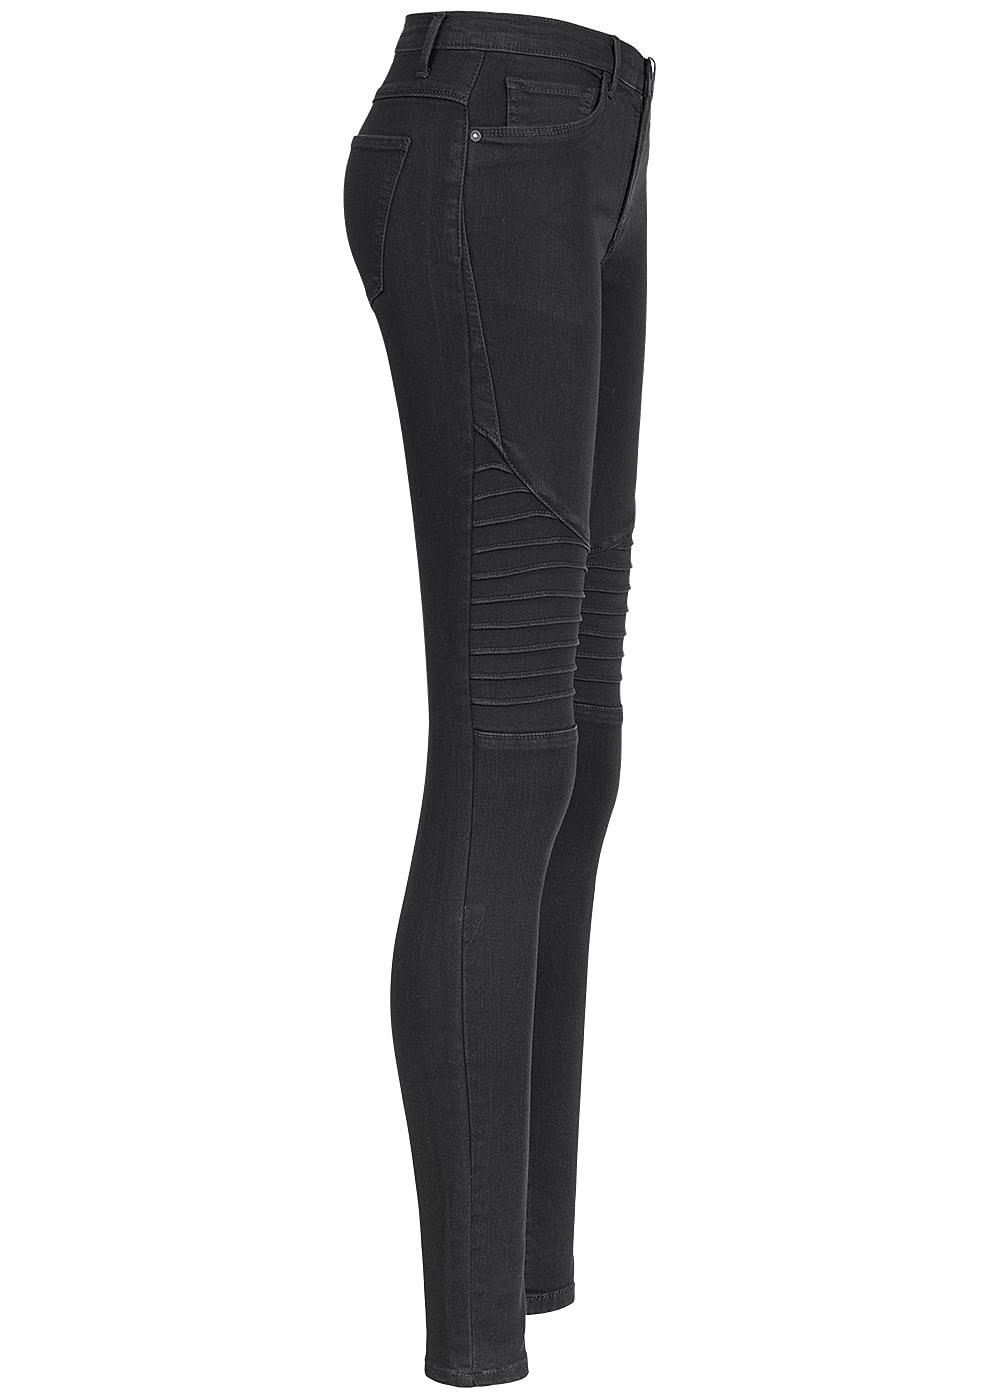 only damen biker jeans hose 2 deko taschen vorne 2 taschen. Black Bedroom Furniture Sets. Home Design Ideas